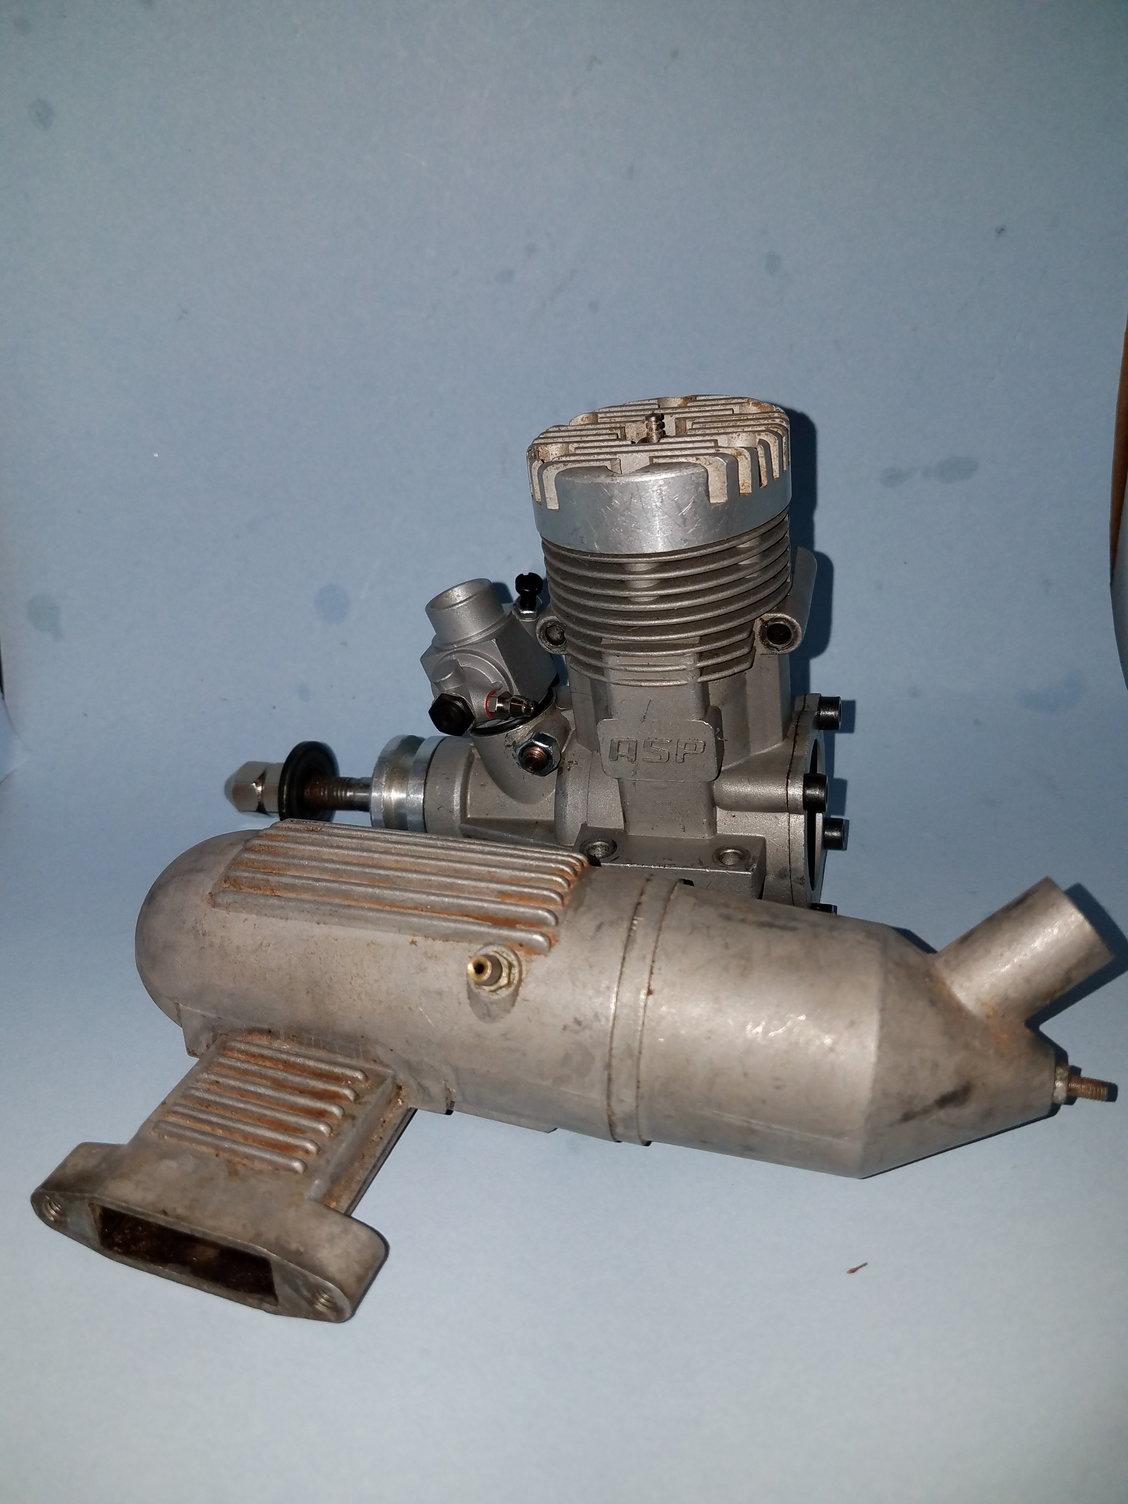 Asp 61 two stroke rc engine - RCU Forums